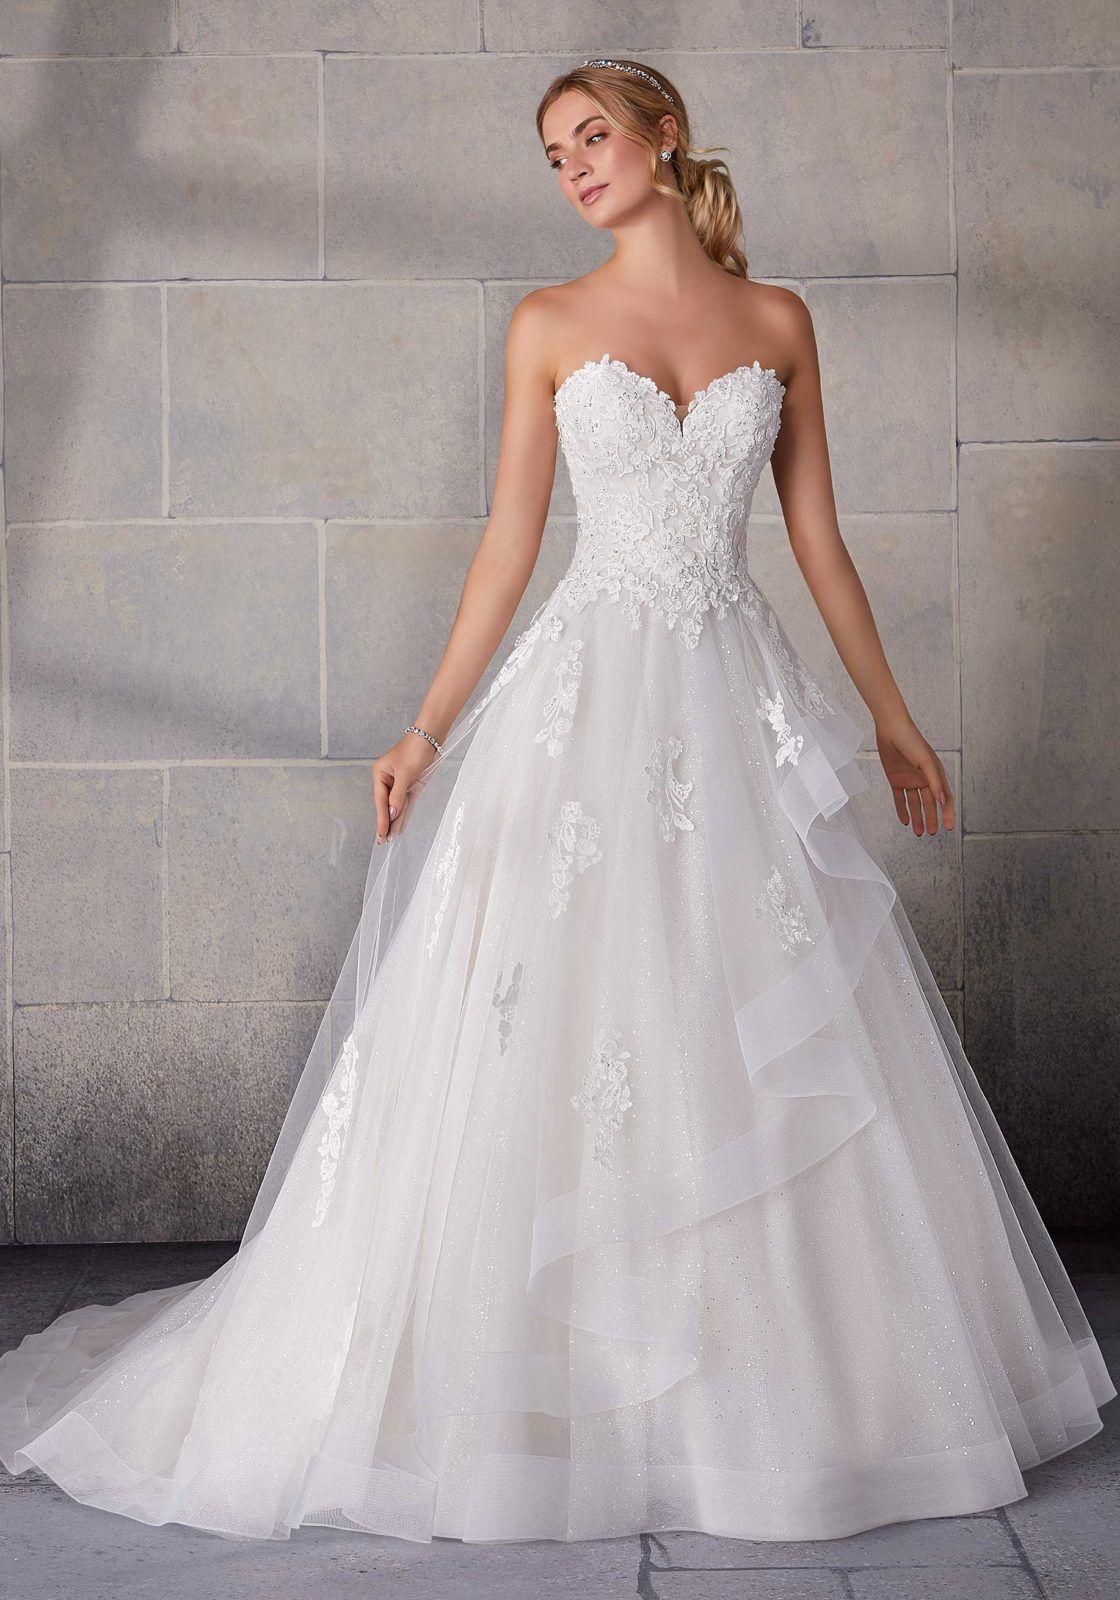 Robin Wedding Dress Morilee Short Wedding Dress Wedding Dresses Satin Winter Wedding Dress